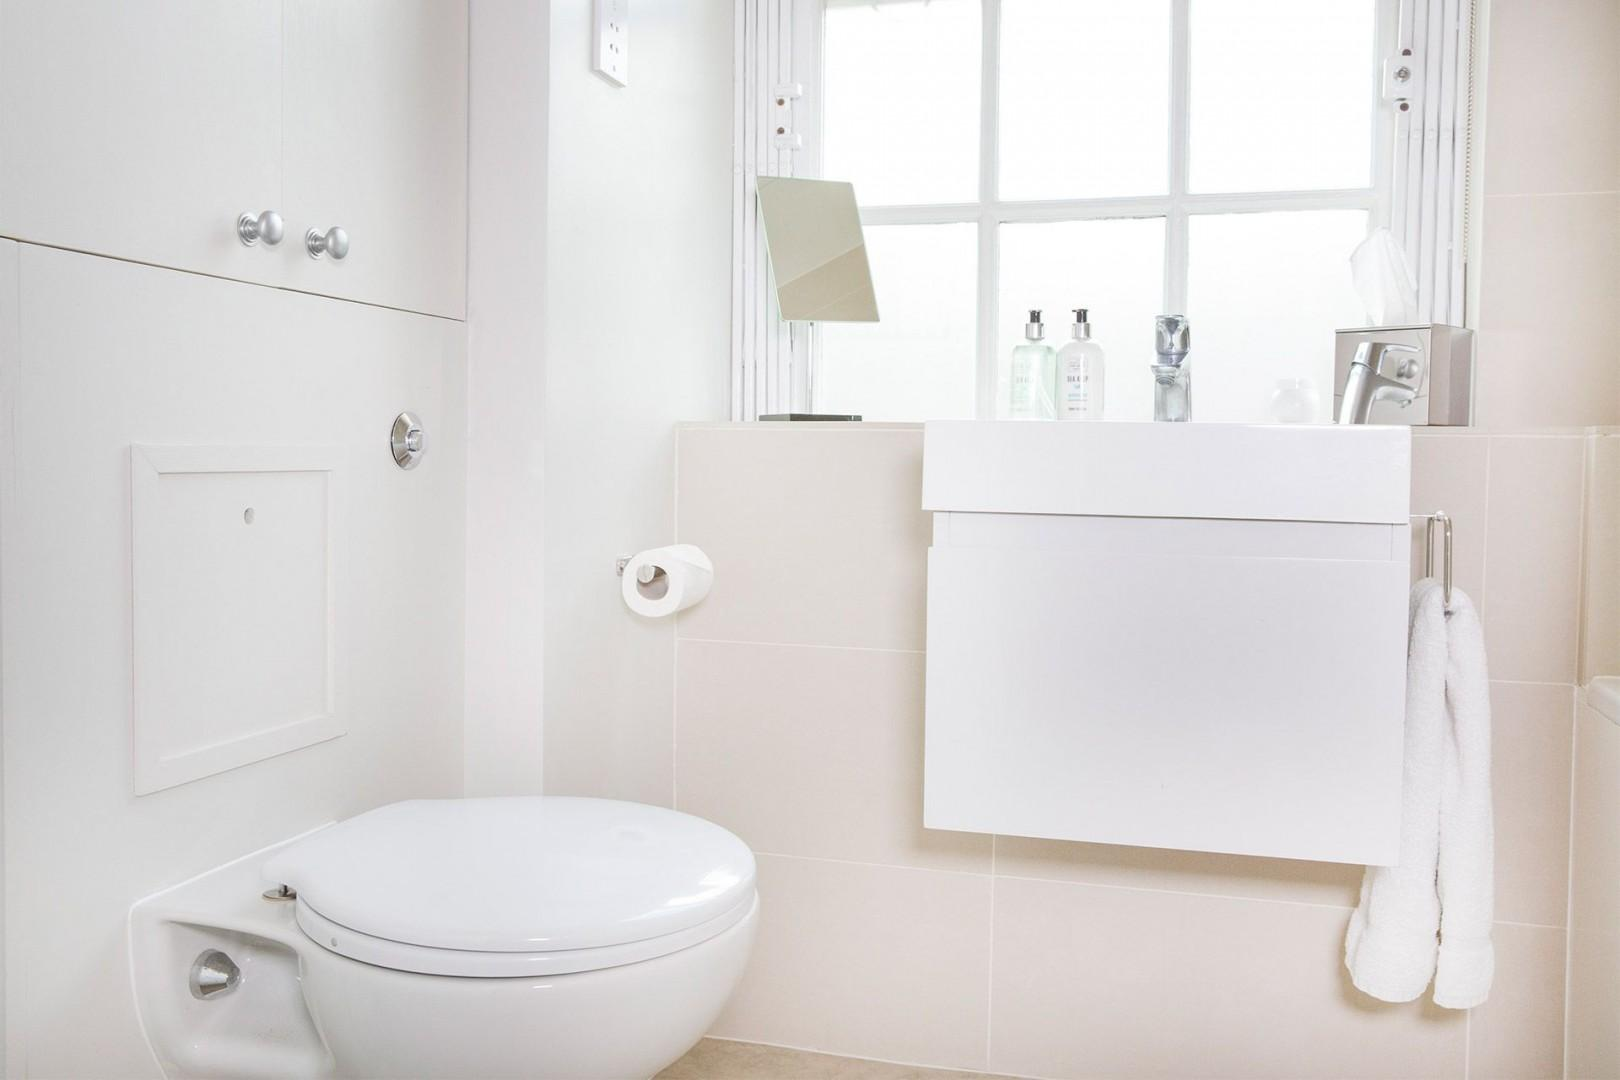 Bathroom with a bath, toilet and sink